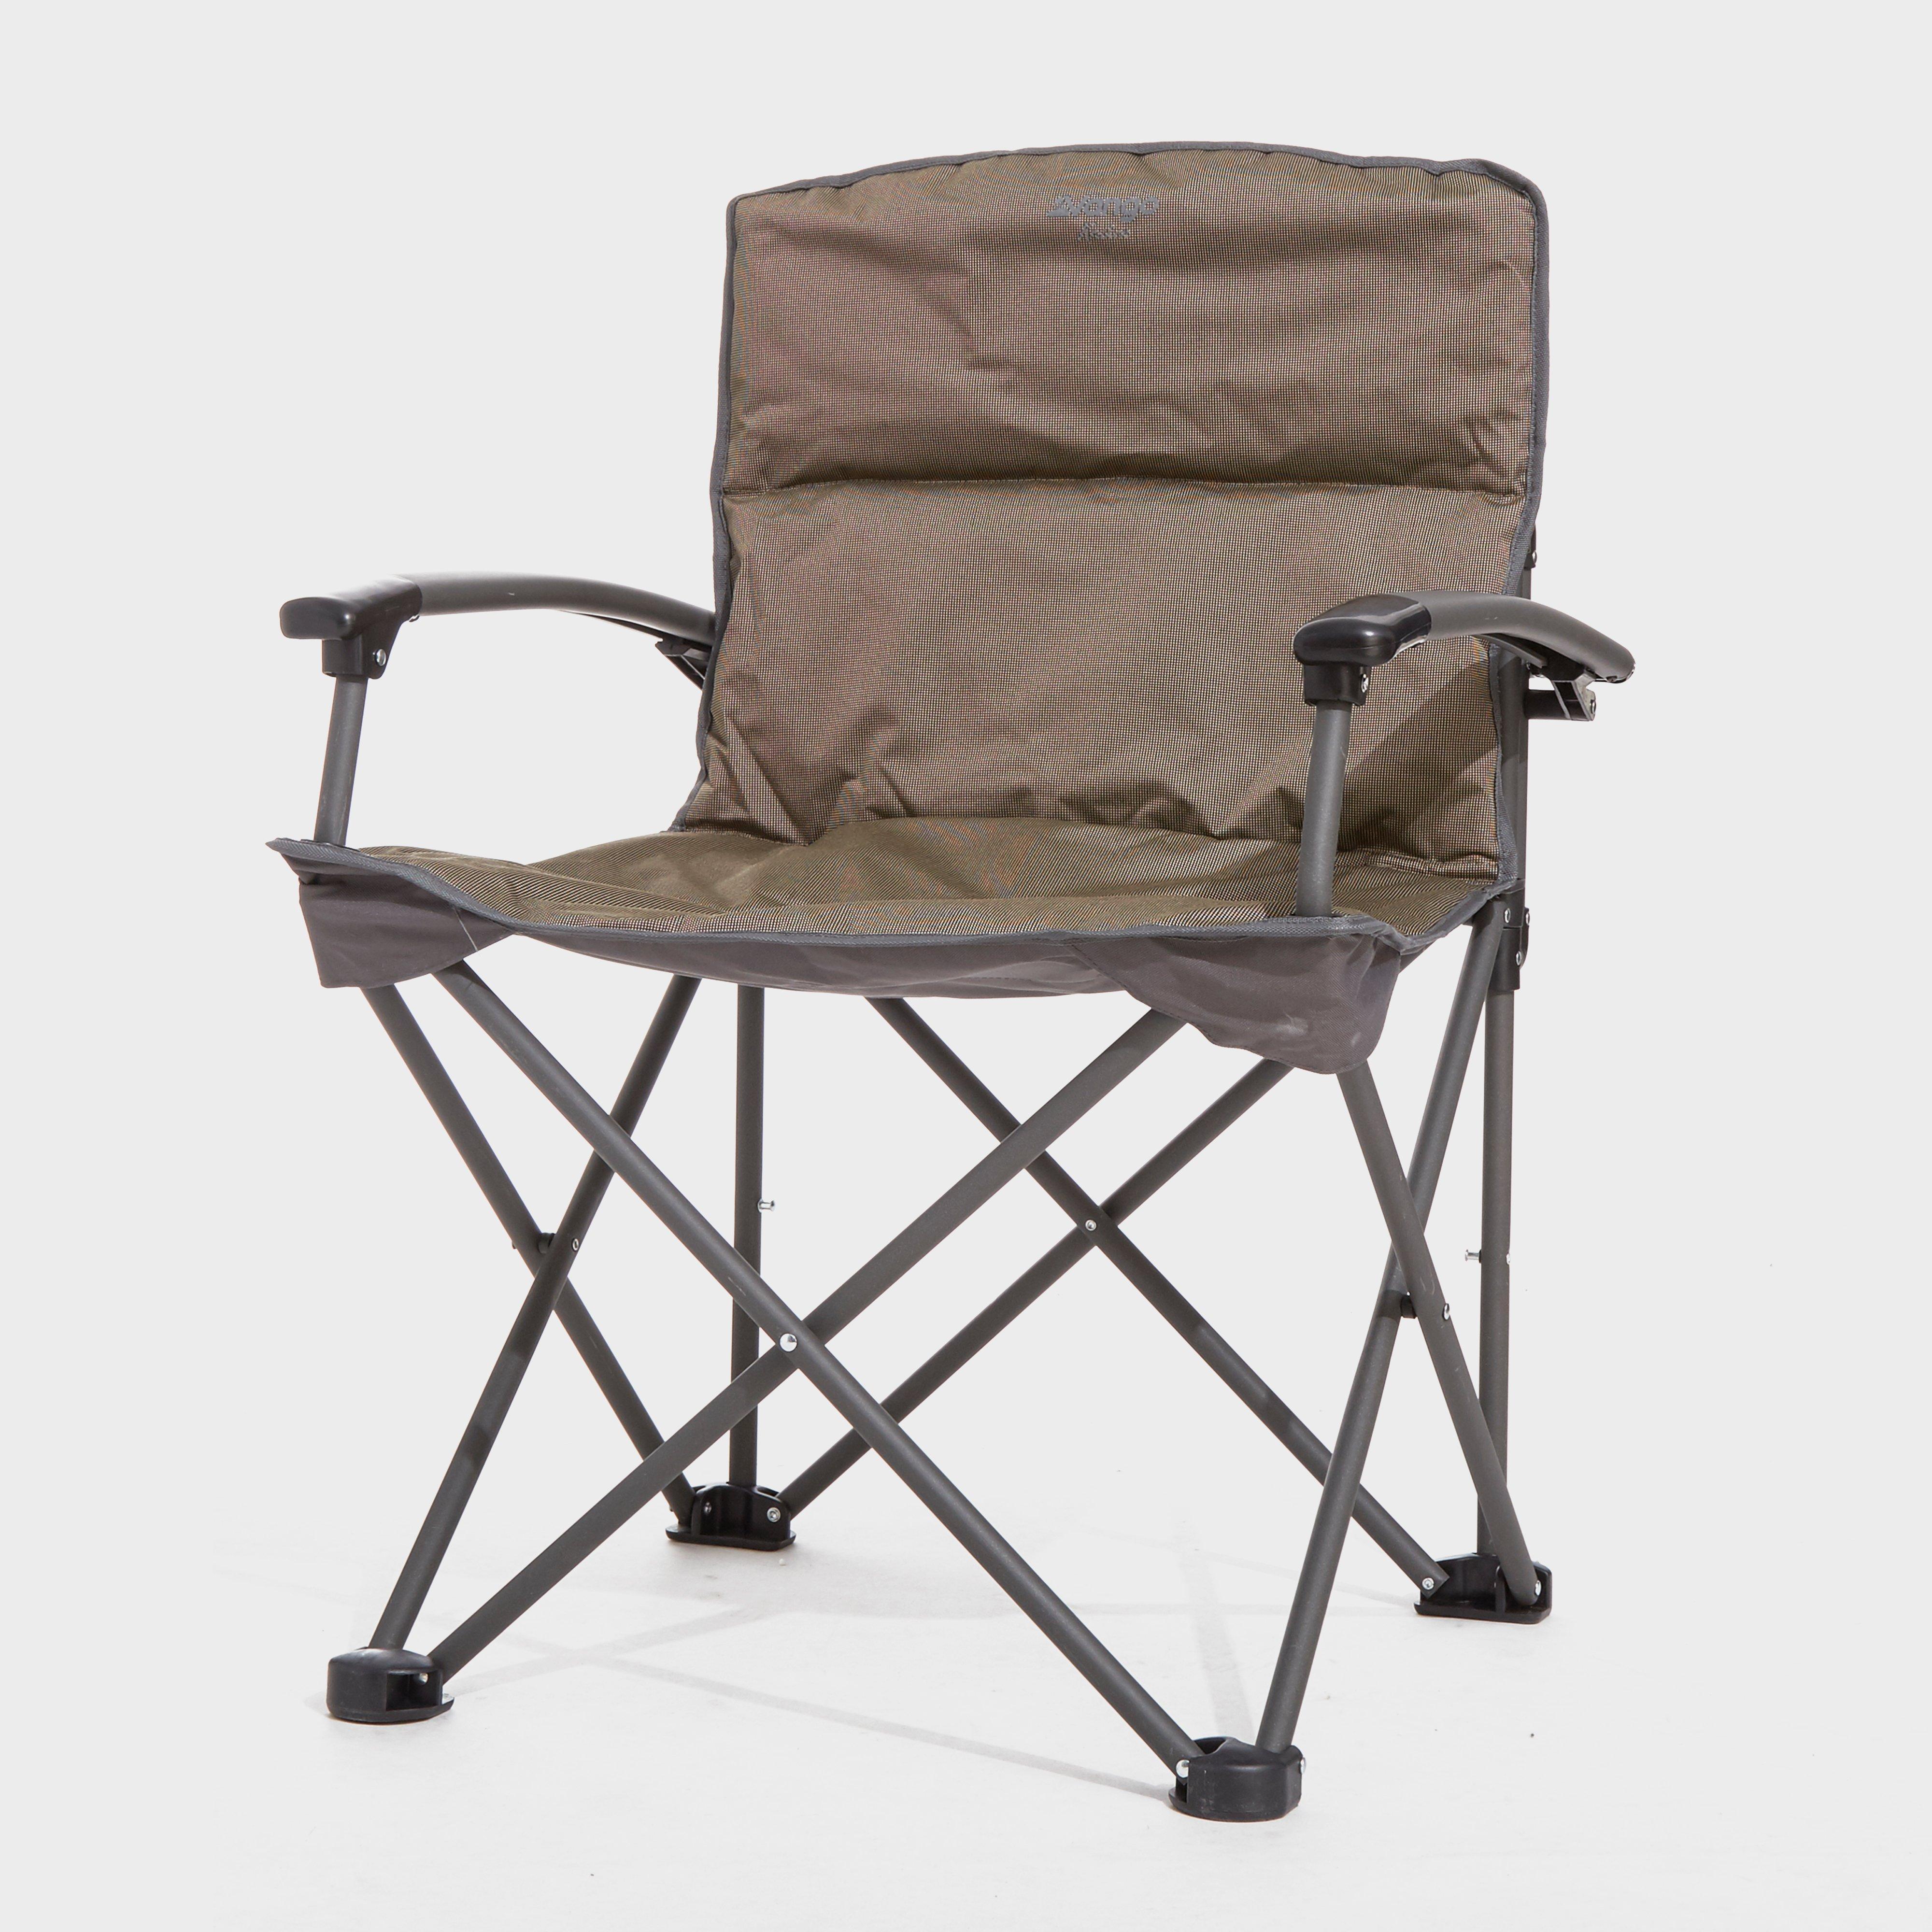 Vango Kraken Camping Chair, Brown